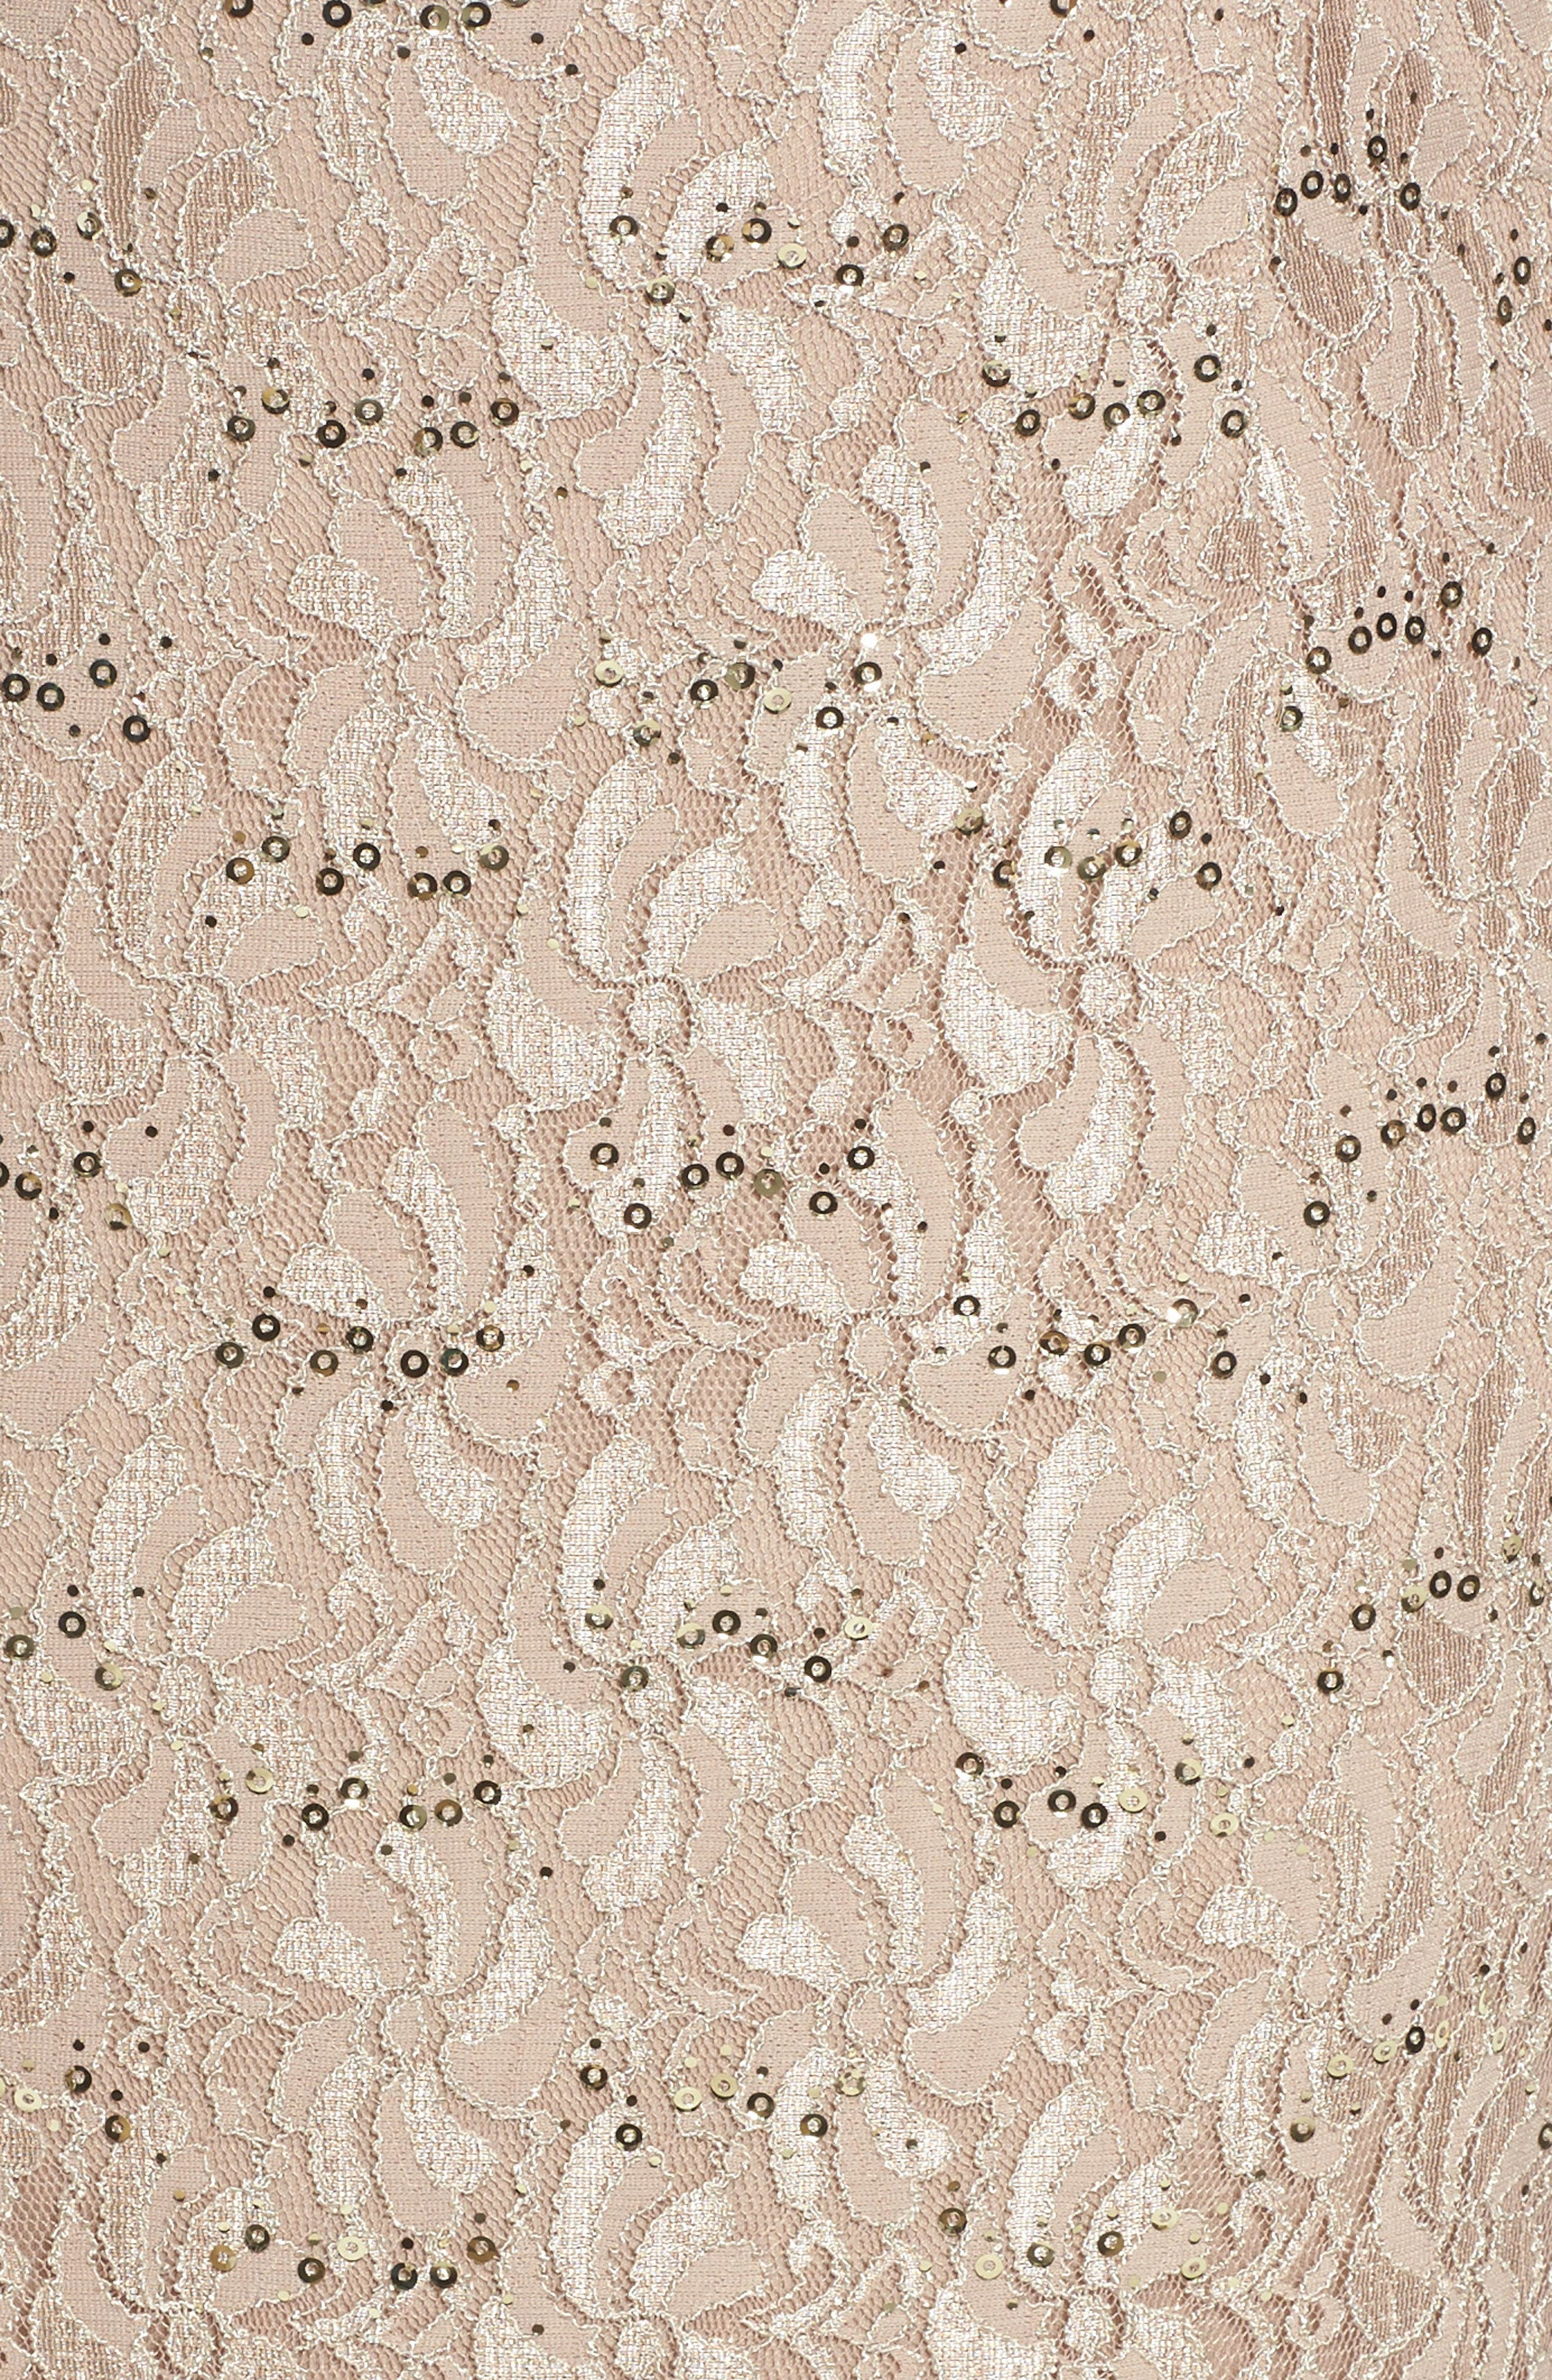 Sequin Lace Gown & Jacket,                             Alternate thumbnail 5, color,                             251